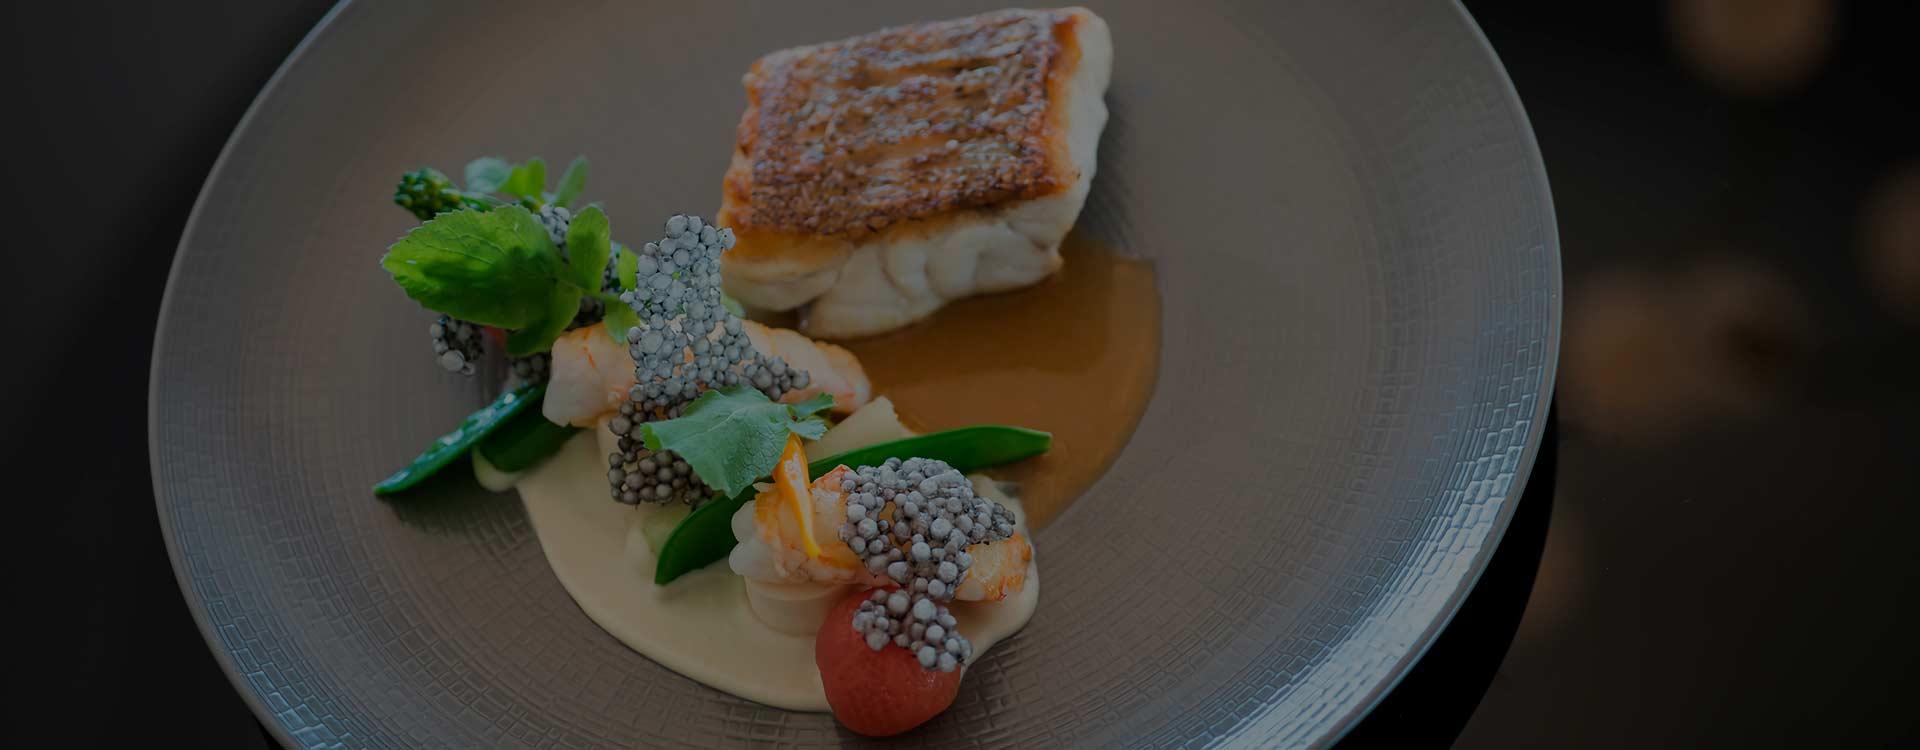 Amara Restaurant | Food | Fish Dishes